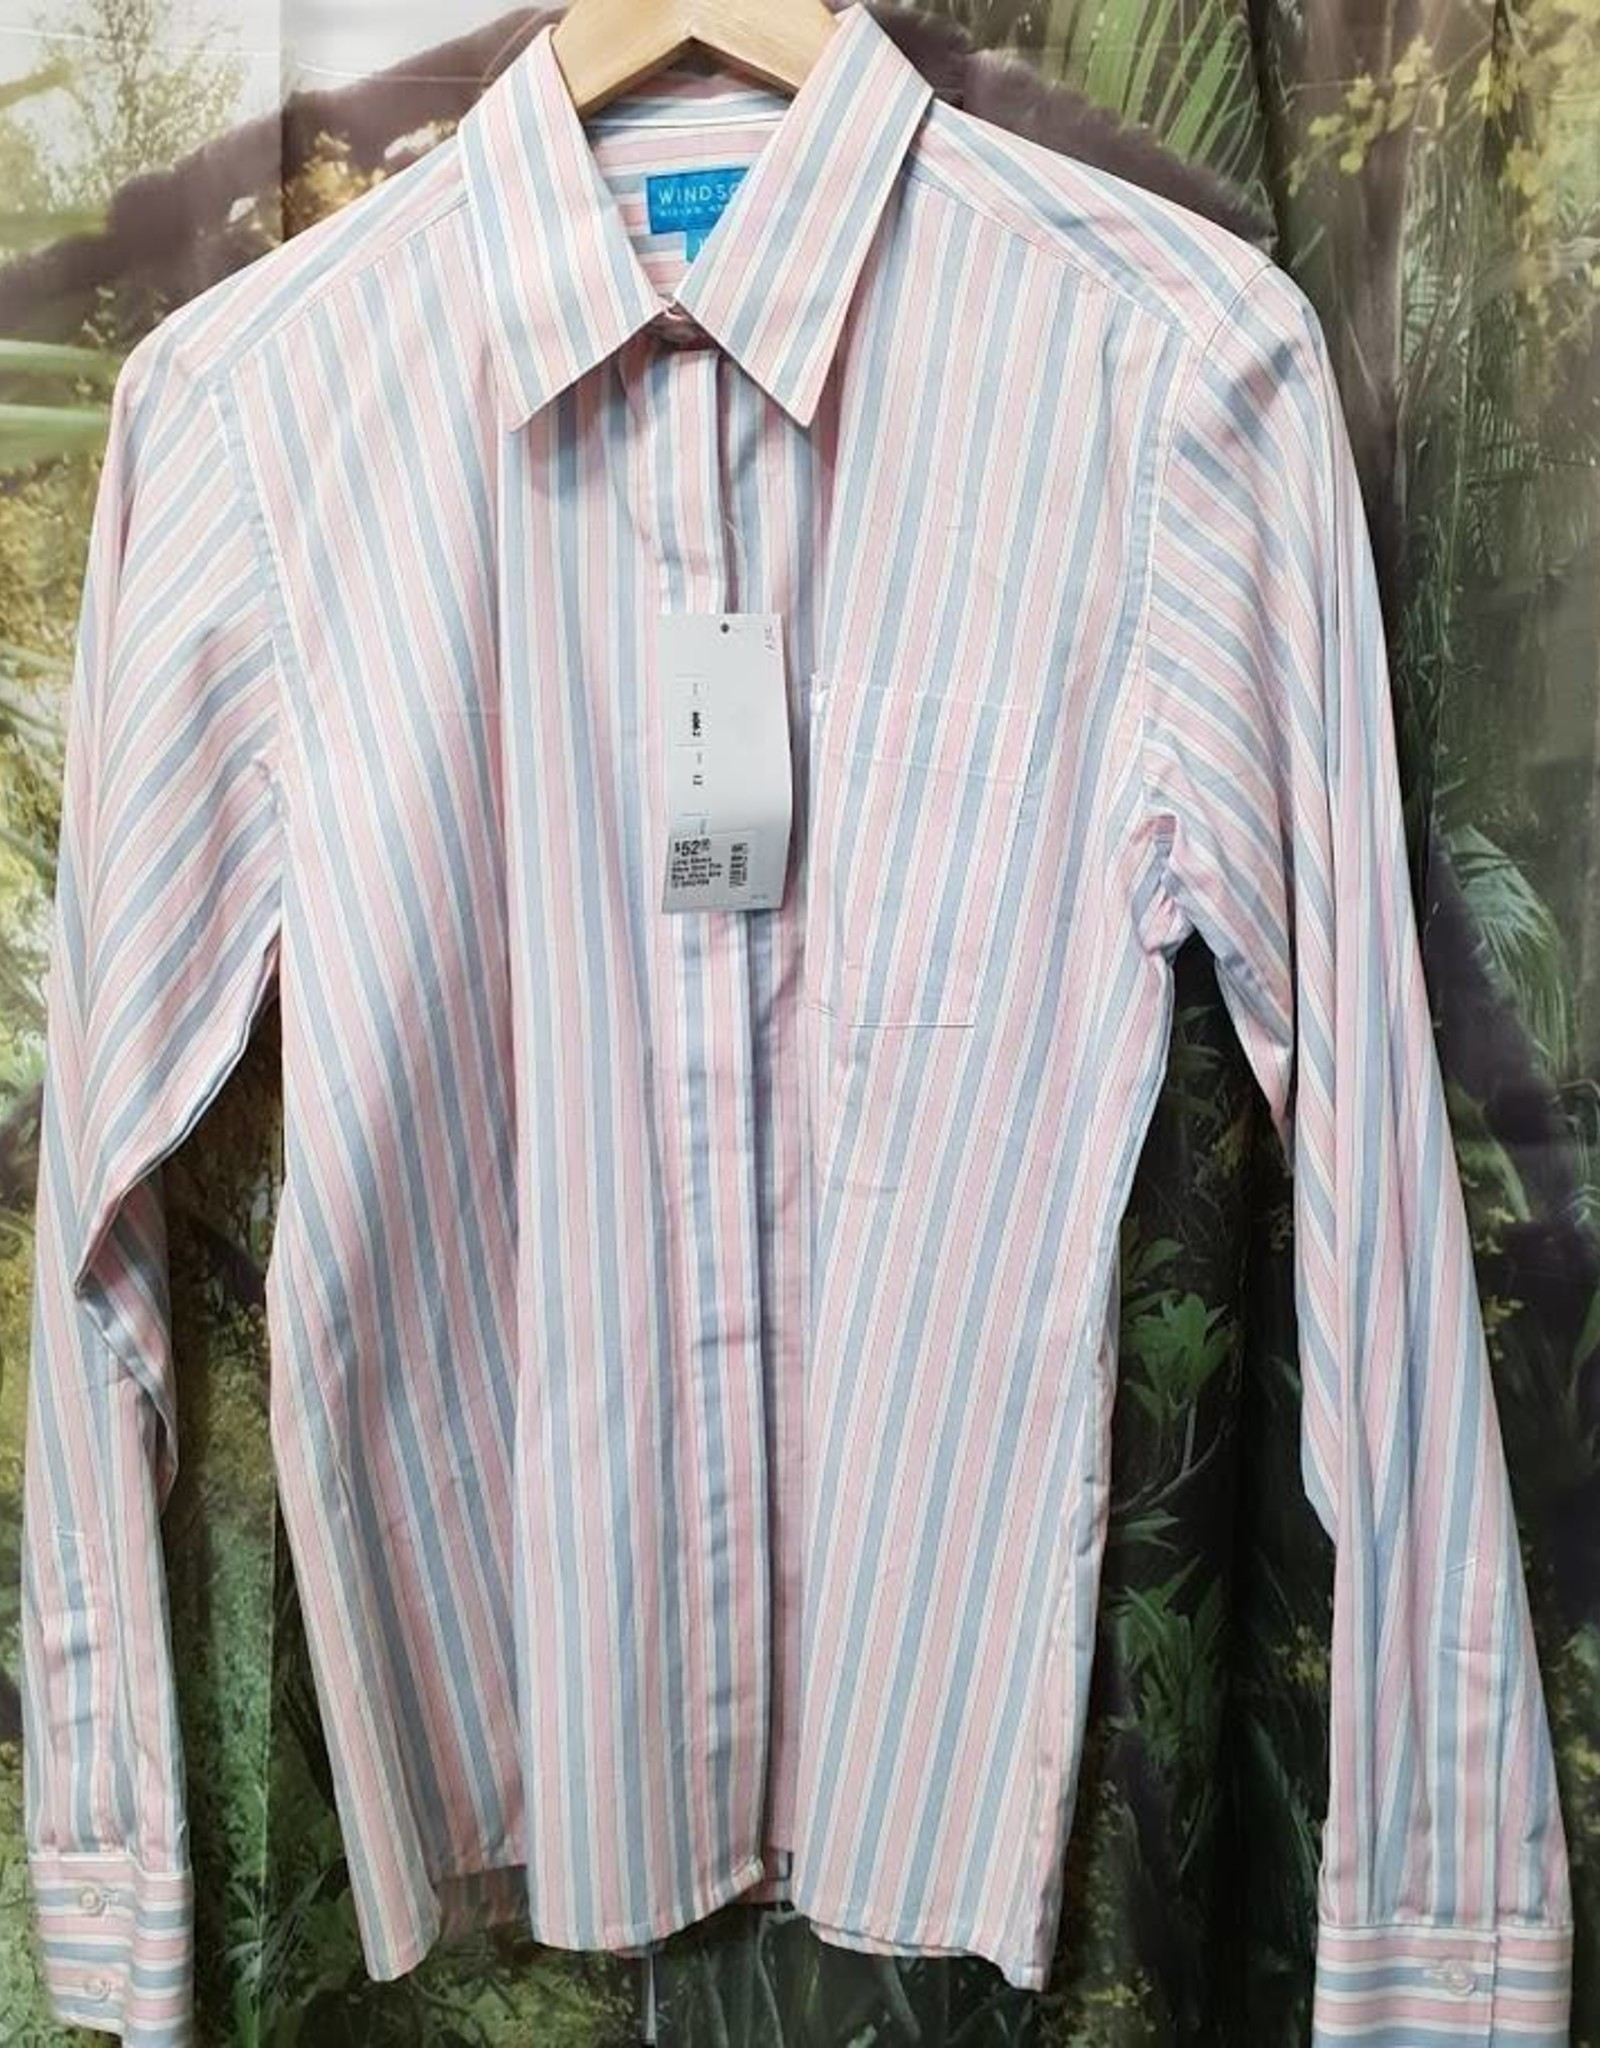 Windsor Apparel Long Sleeve Show Shirt - Pink/Blue/White - Size 12